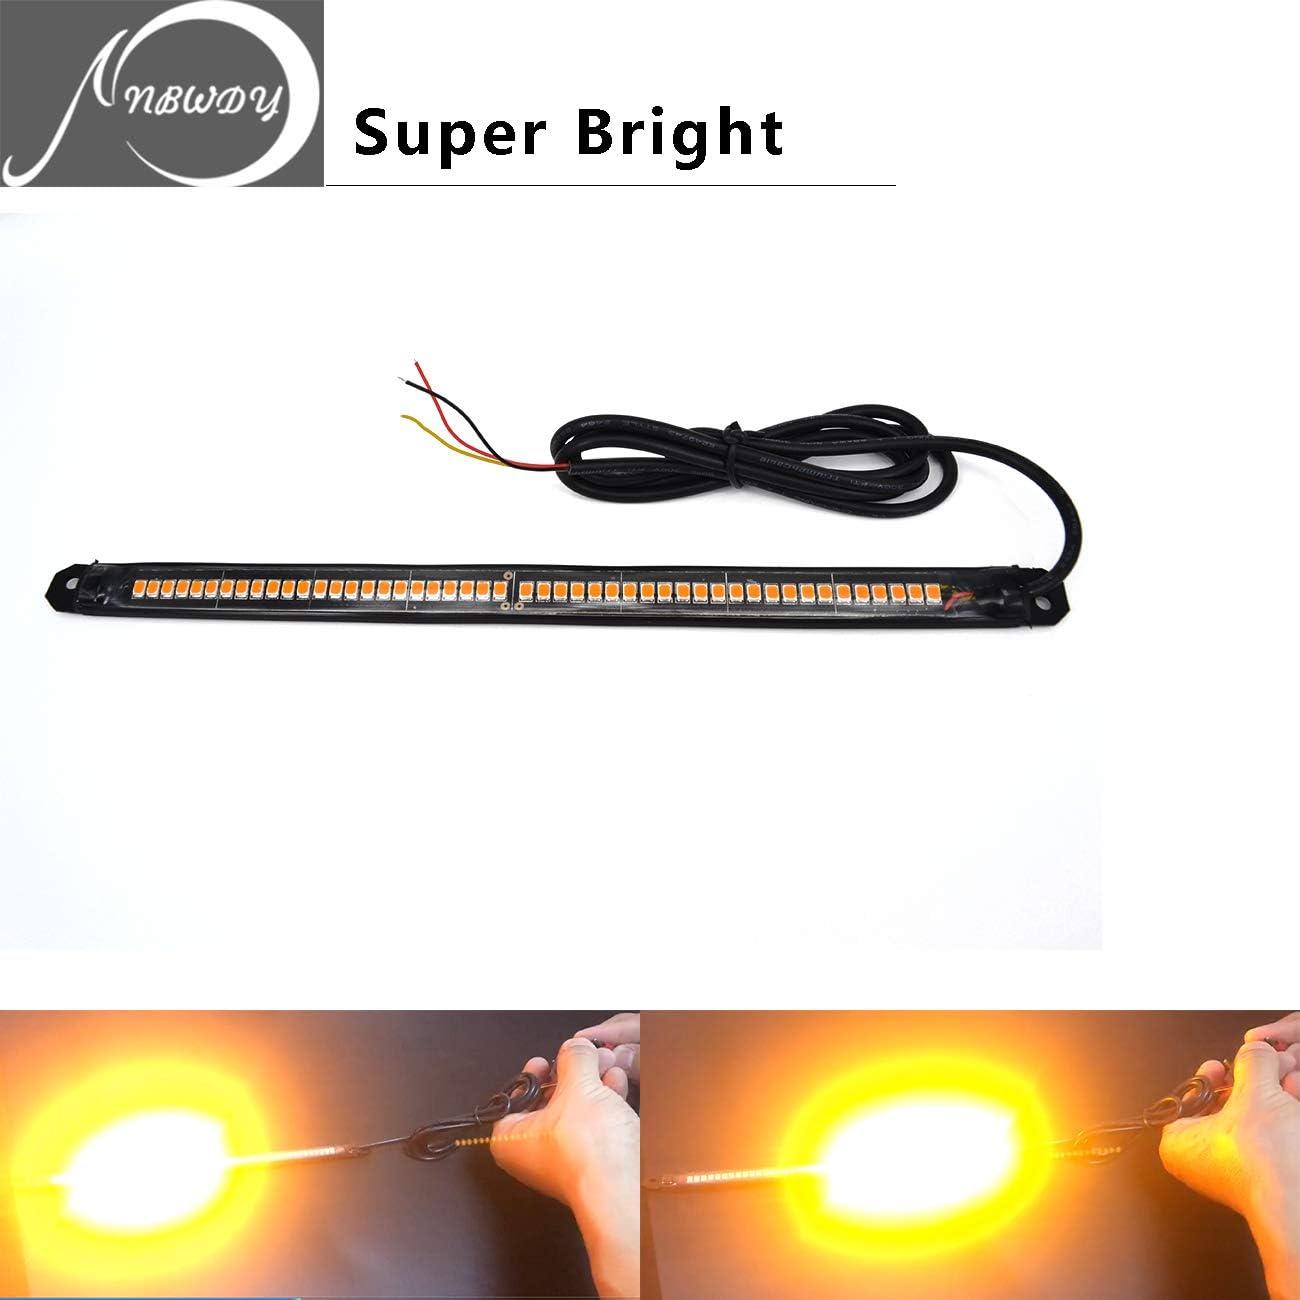 NBWDY Flexible DC12V 48SMD 8LED Light Strip Tail//Trailer//Turn Signal//License Plate Running Lights for Motorcycle Bike ATV Car RV SUV